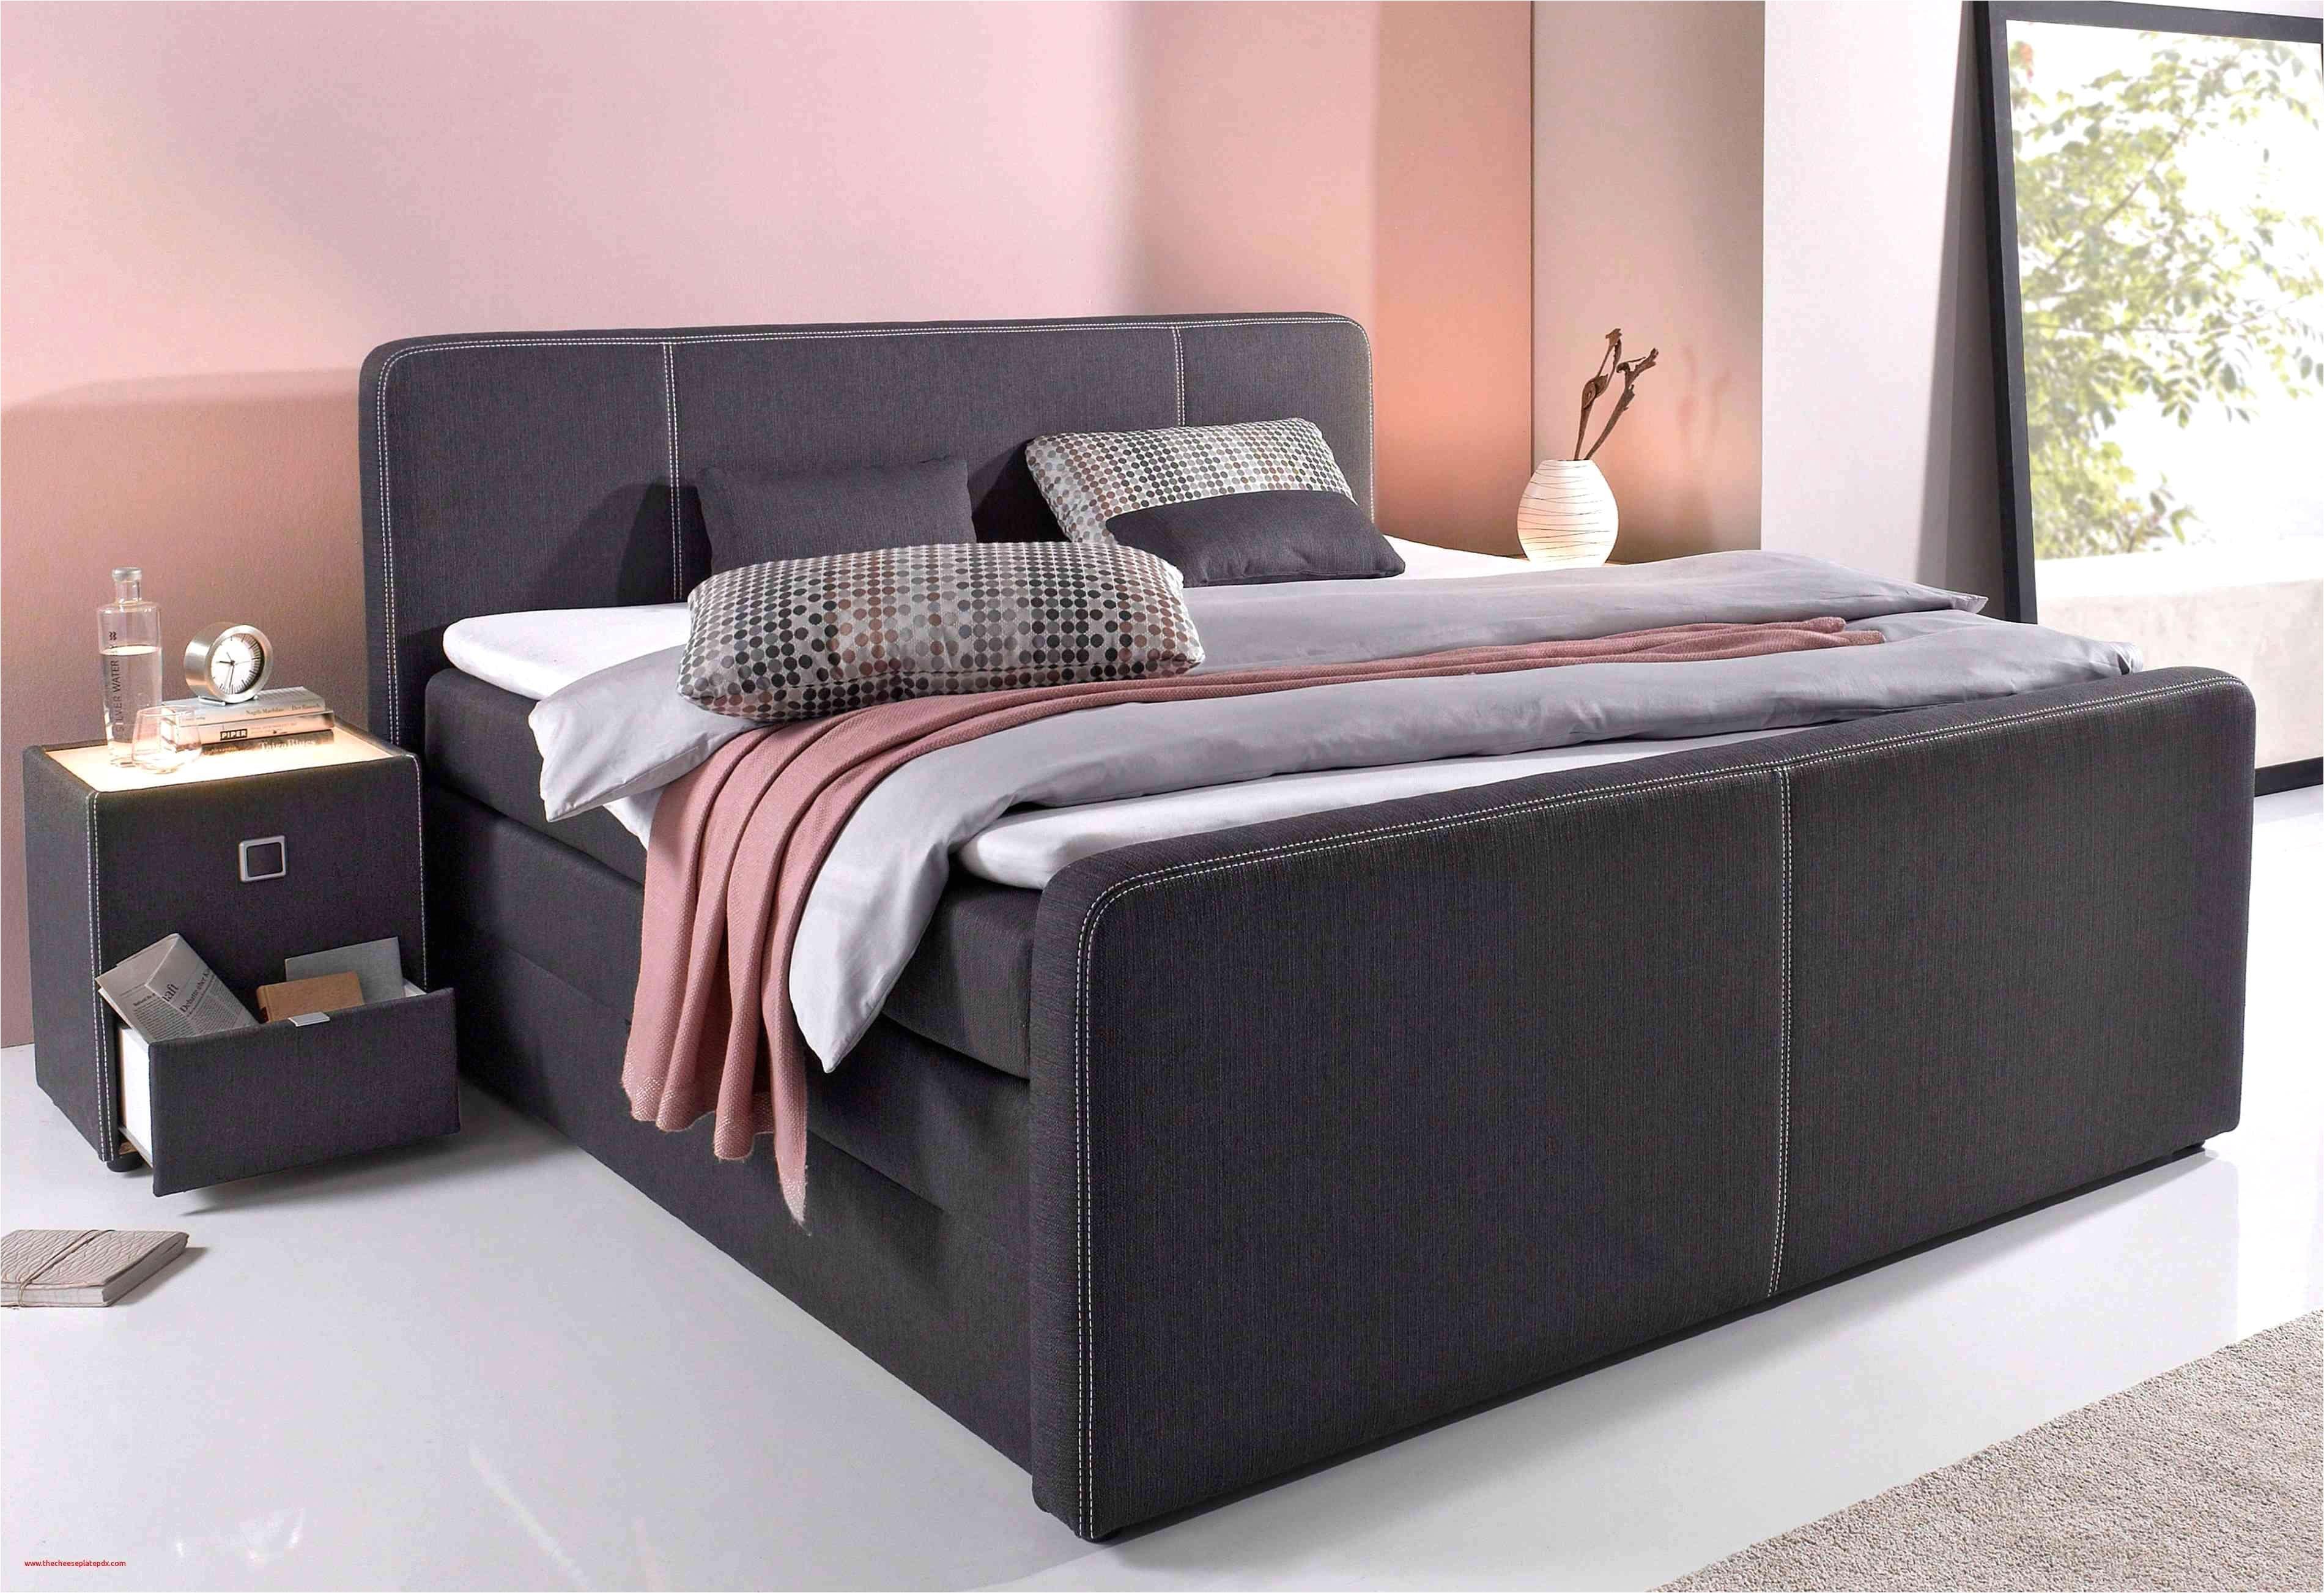 ikea bettcouch beste ikea sofa bett genial bett 140 stilvoll bett kaufen 140 200 11